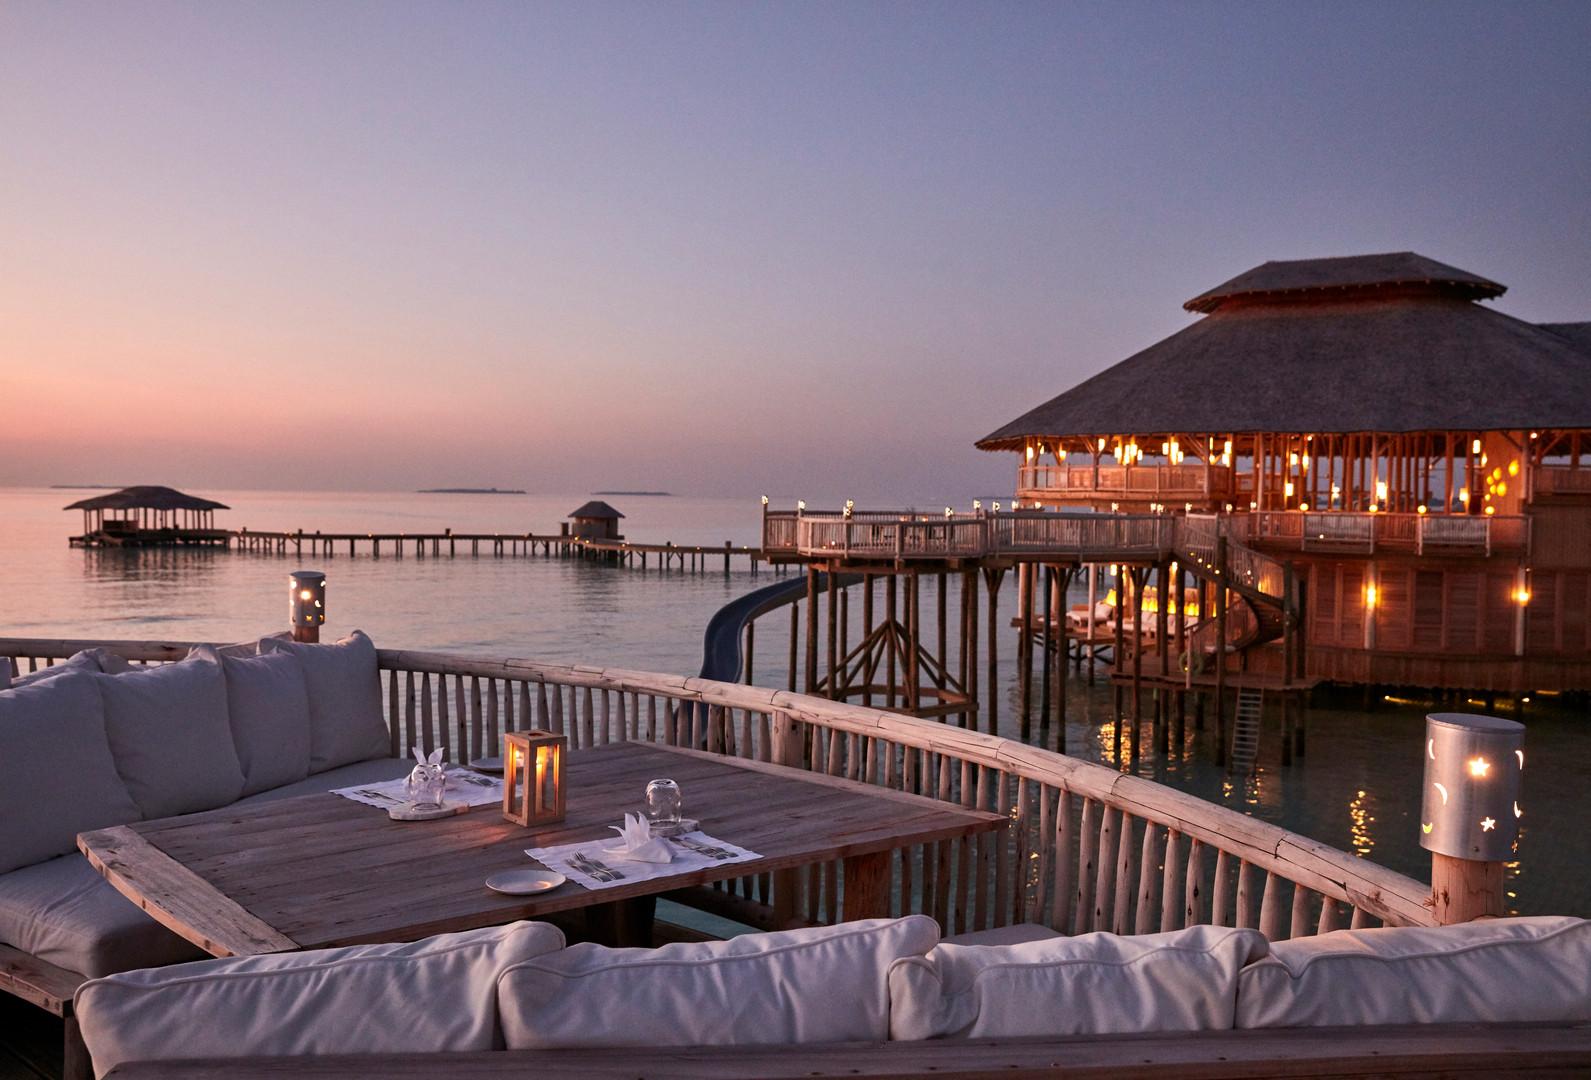 3786_Soneva Jani Resort Dining - So Star